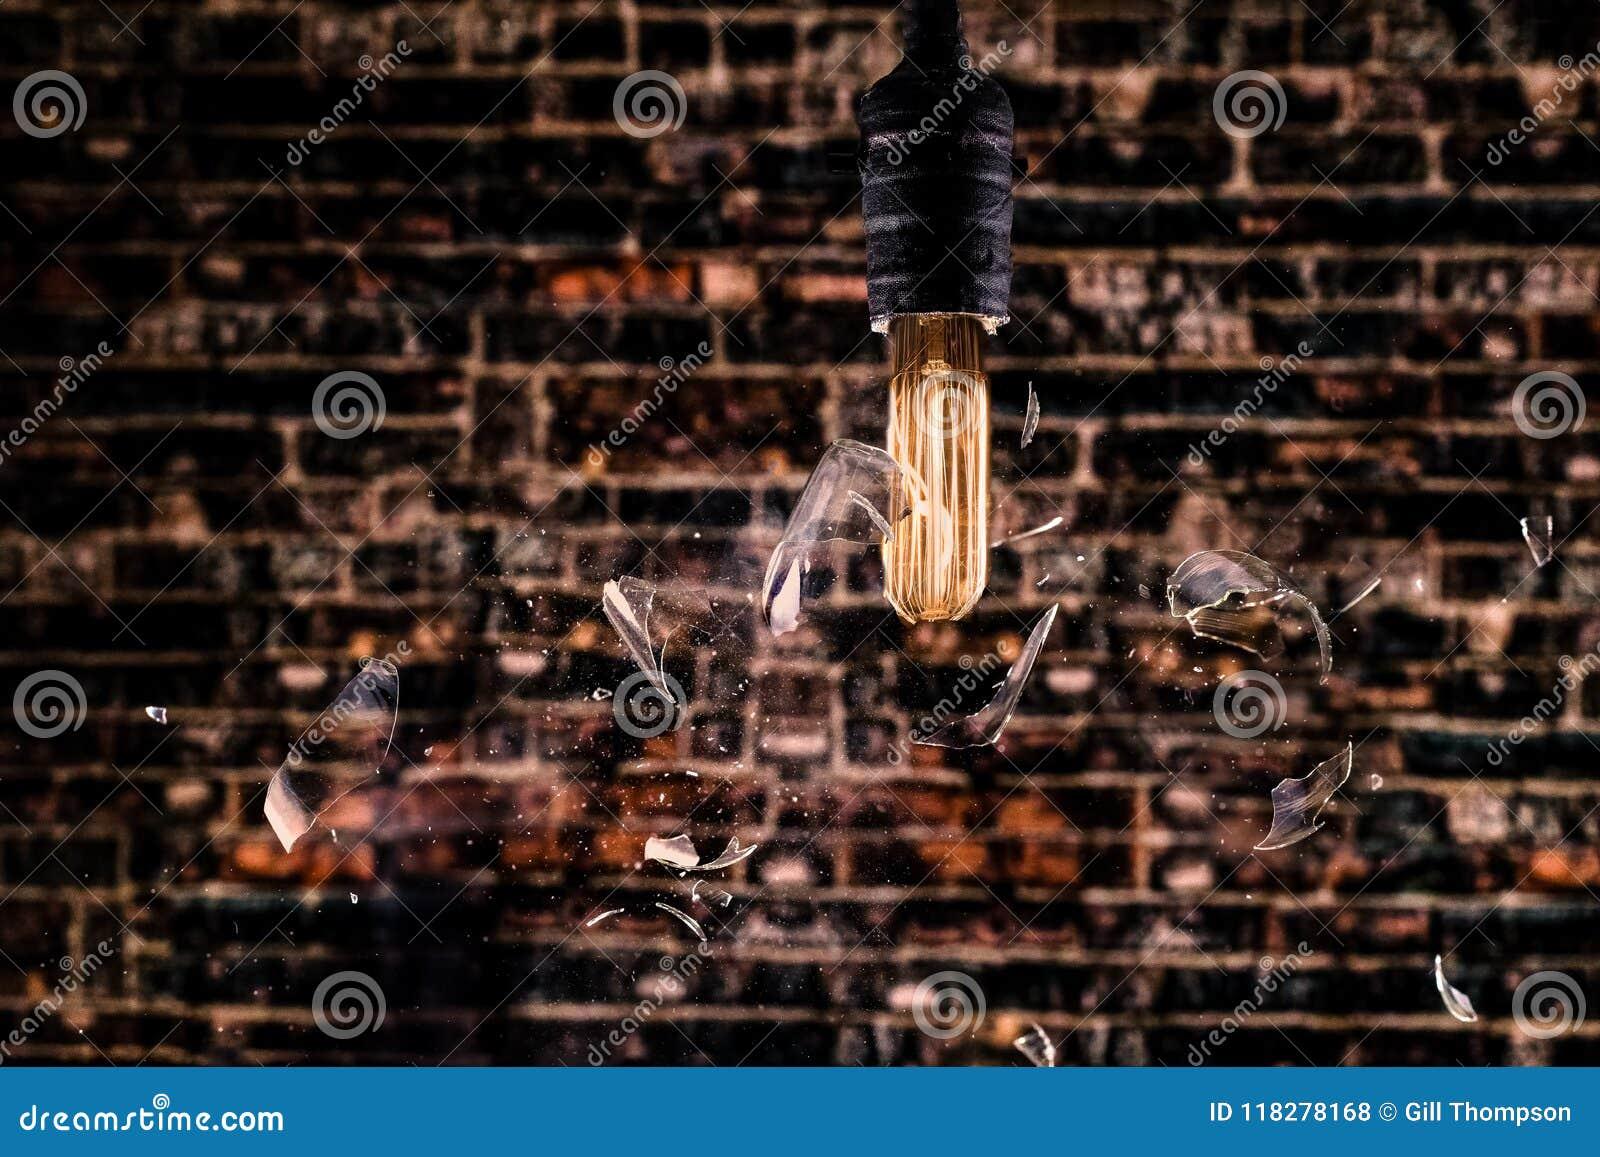 Lit Edison Bulb Shattering Prior aan gloeidraad die zich uitbranden